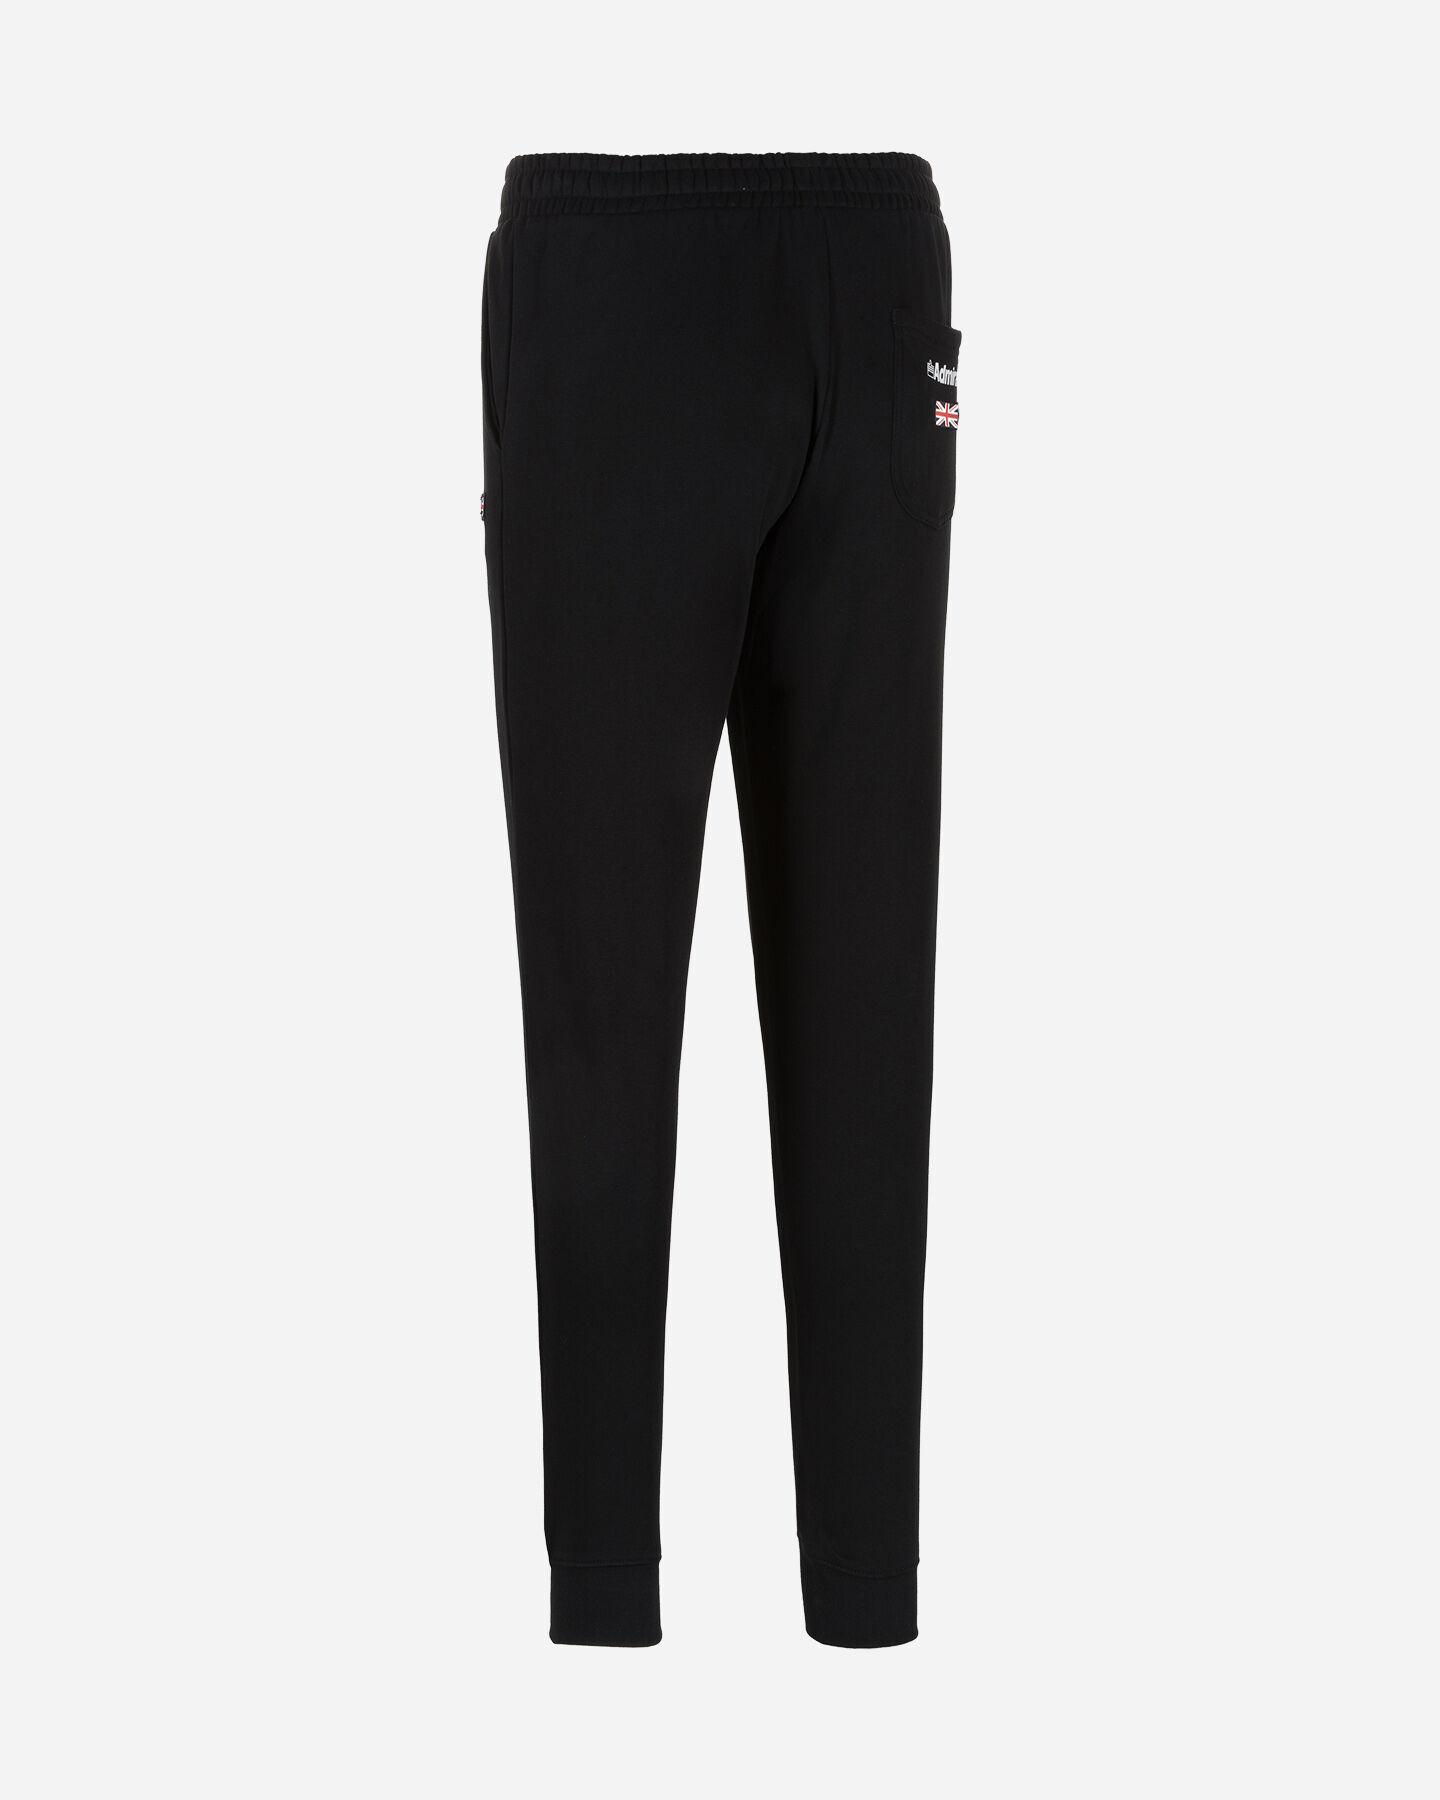 Pantalone ADMIRAL BASIC LOGO M S4073958 scatto 1